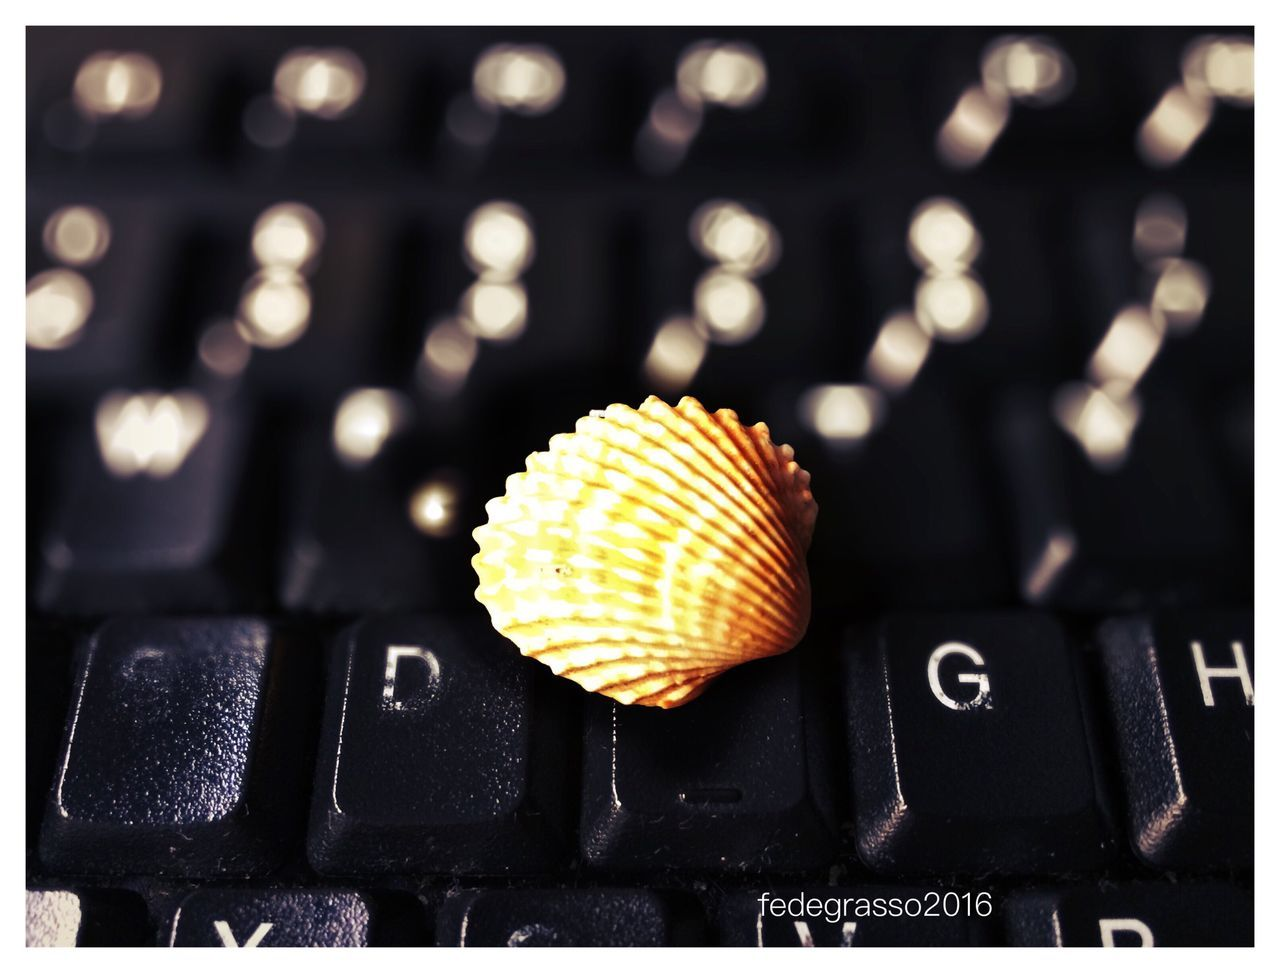 Shell Shells🐚 Conchiglie Marine Conchiglie